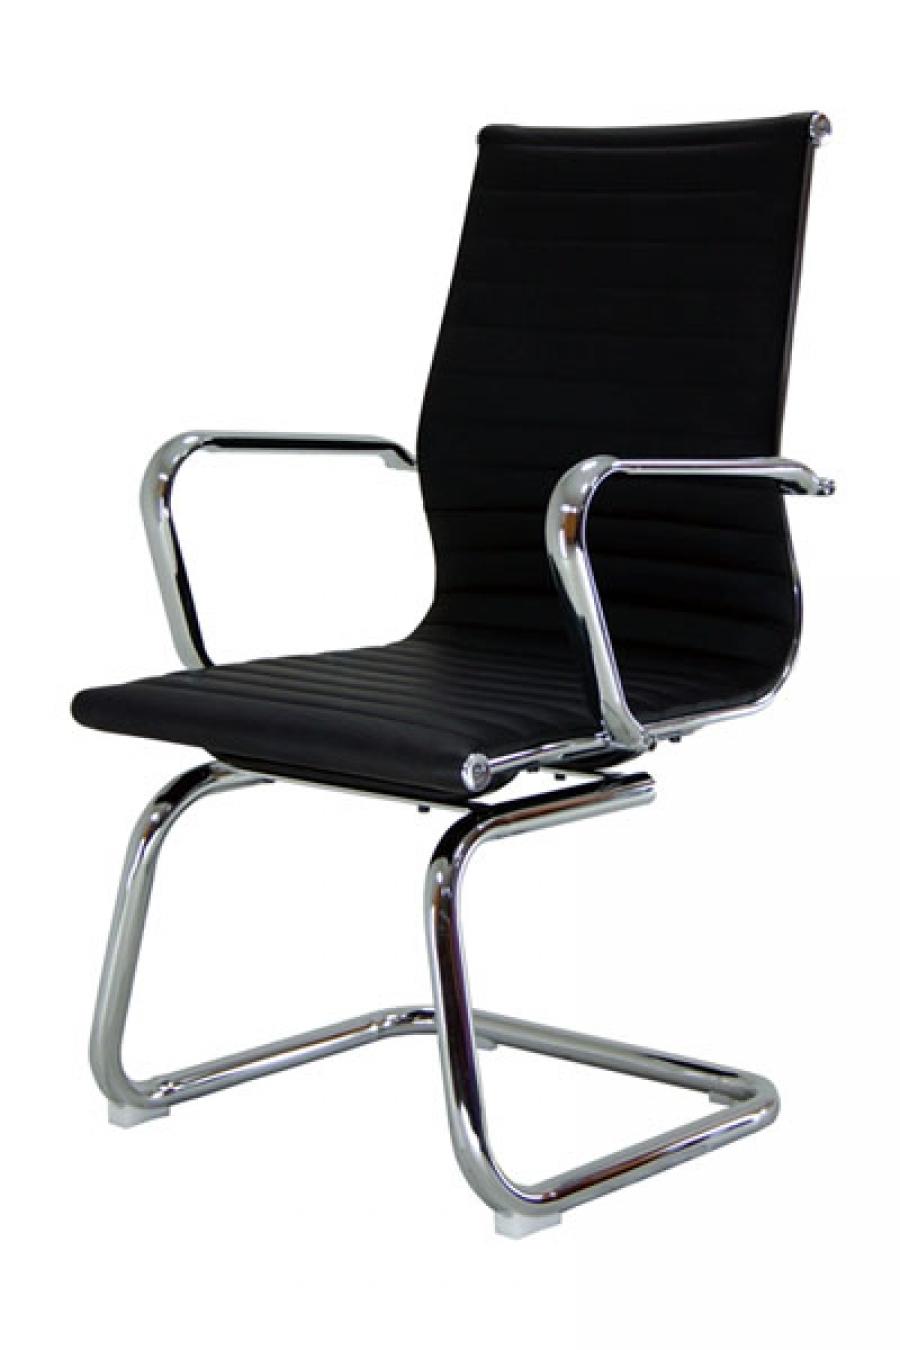 Sillas de oficina ergon micas for Sillas de oficina ergonomicas